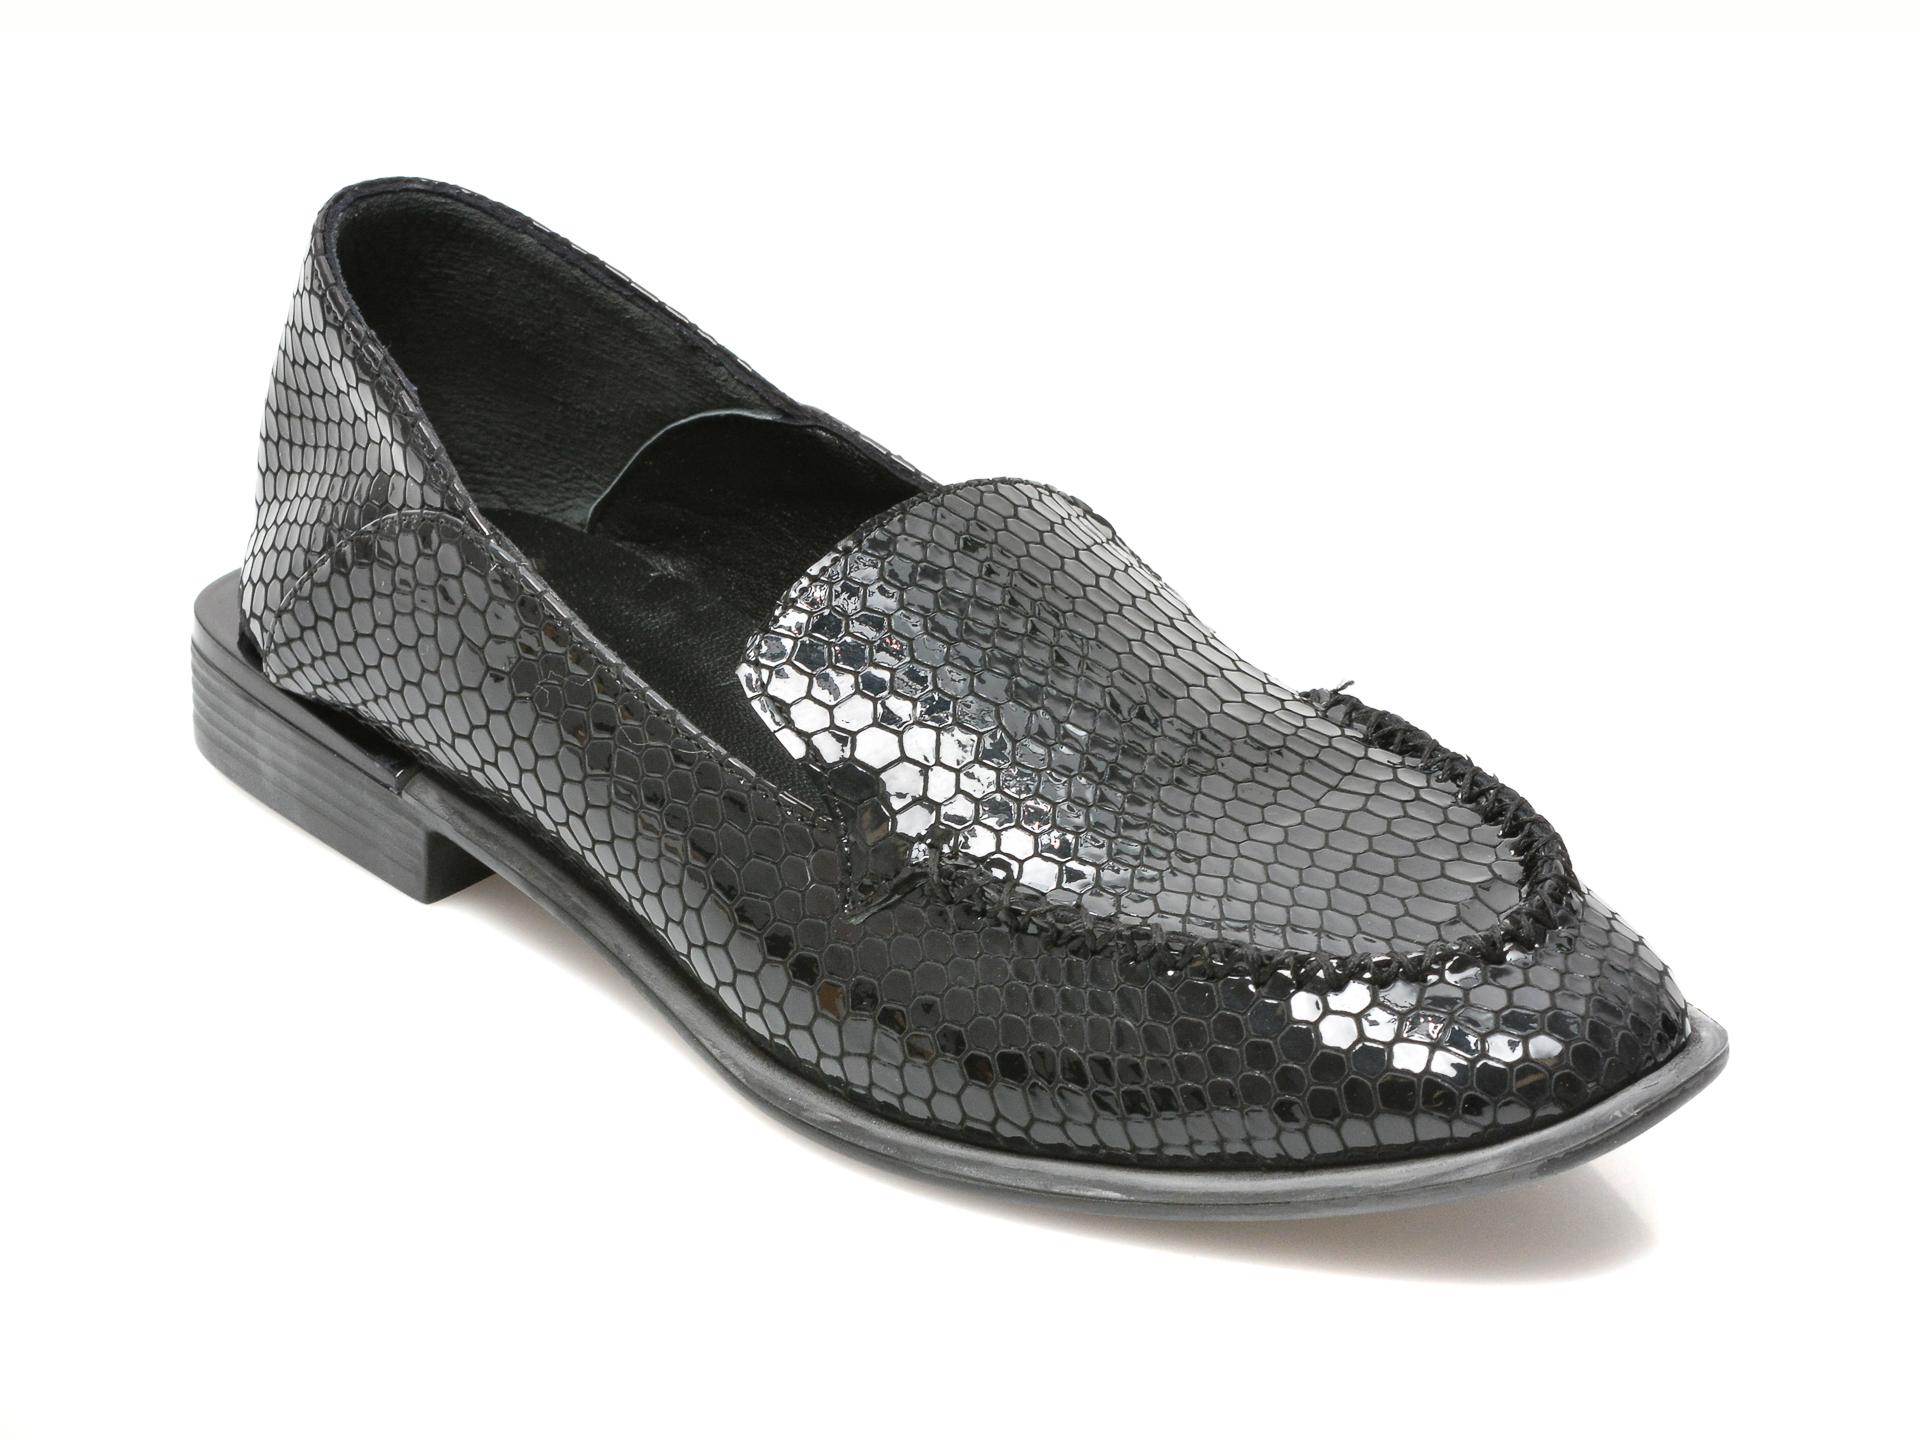 Pantofi Lolilella Bleumarin, 1400, Din Piele Croco